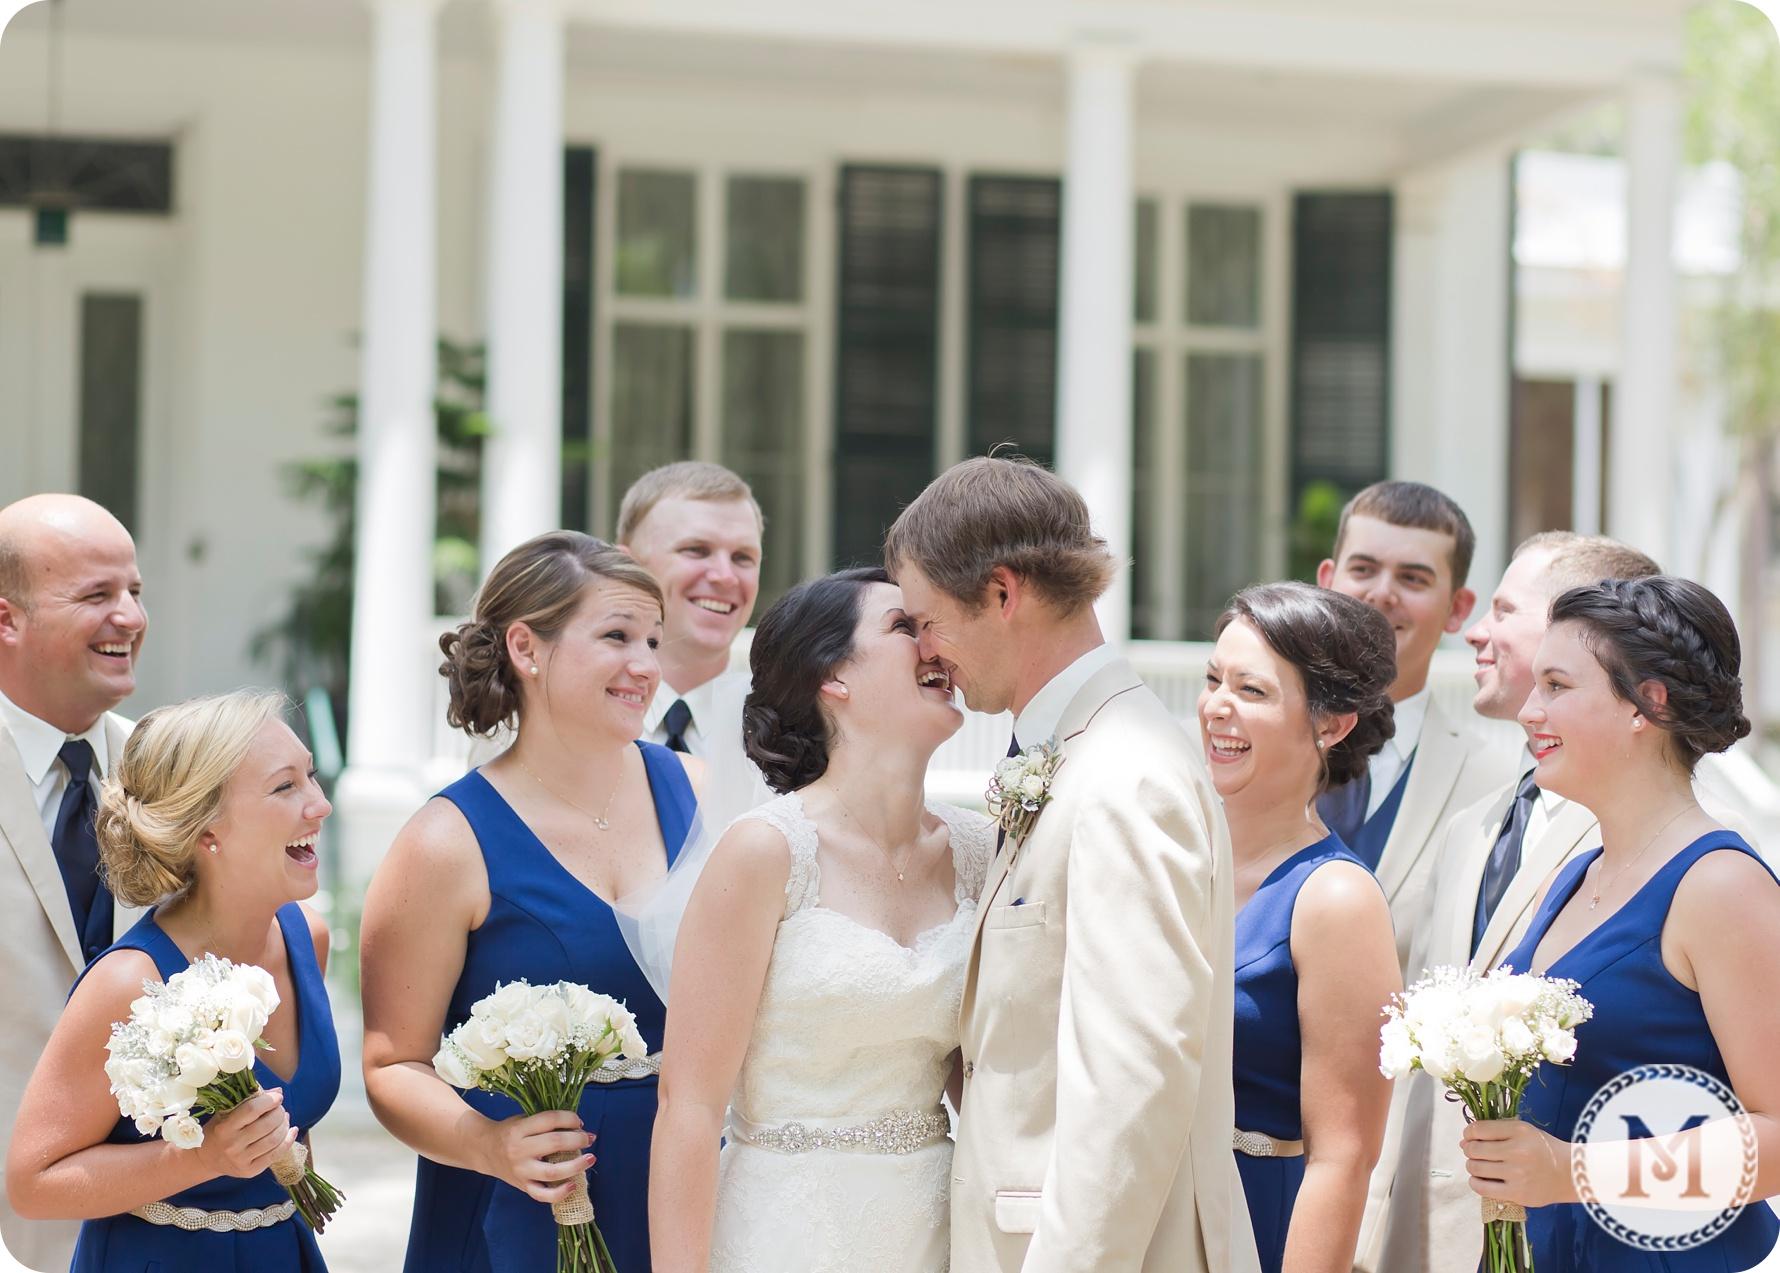 mckenziesmithphotography.com_0132